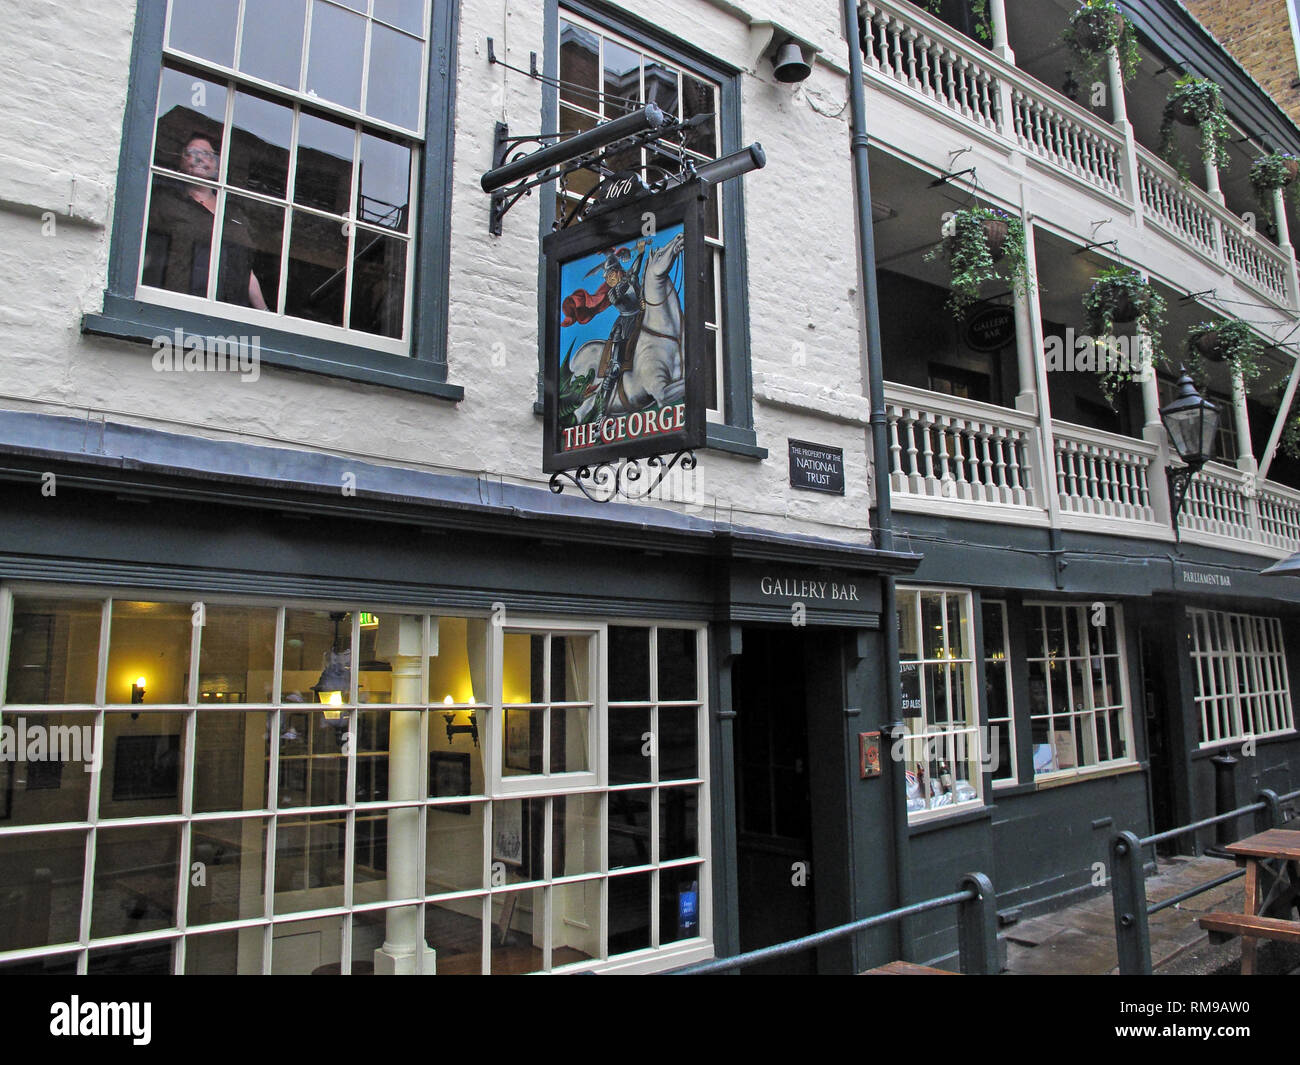 GoTonySmith,HotpixUK,@HotpixUK,England,UK,GB,London,city,centre,South